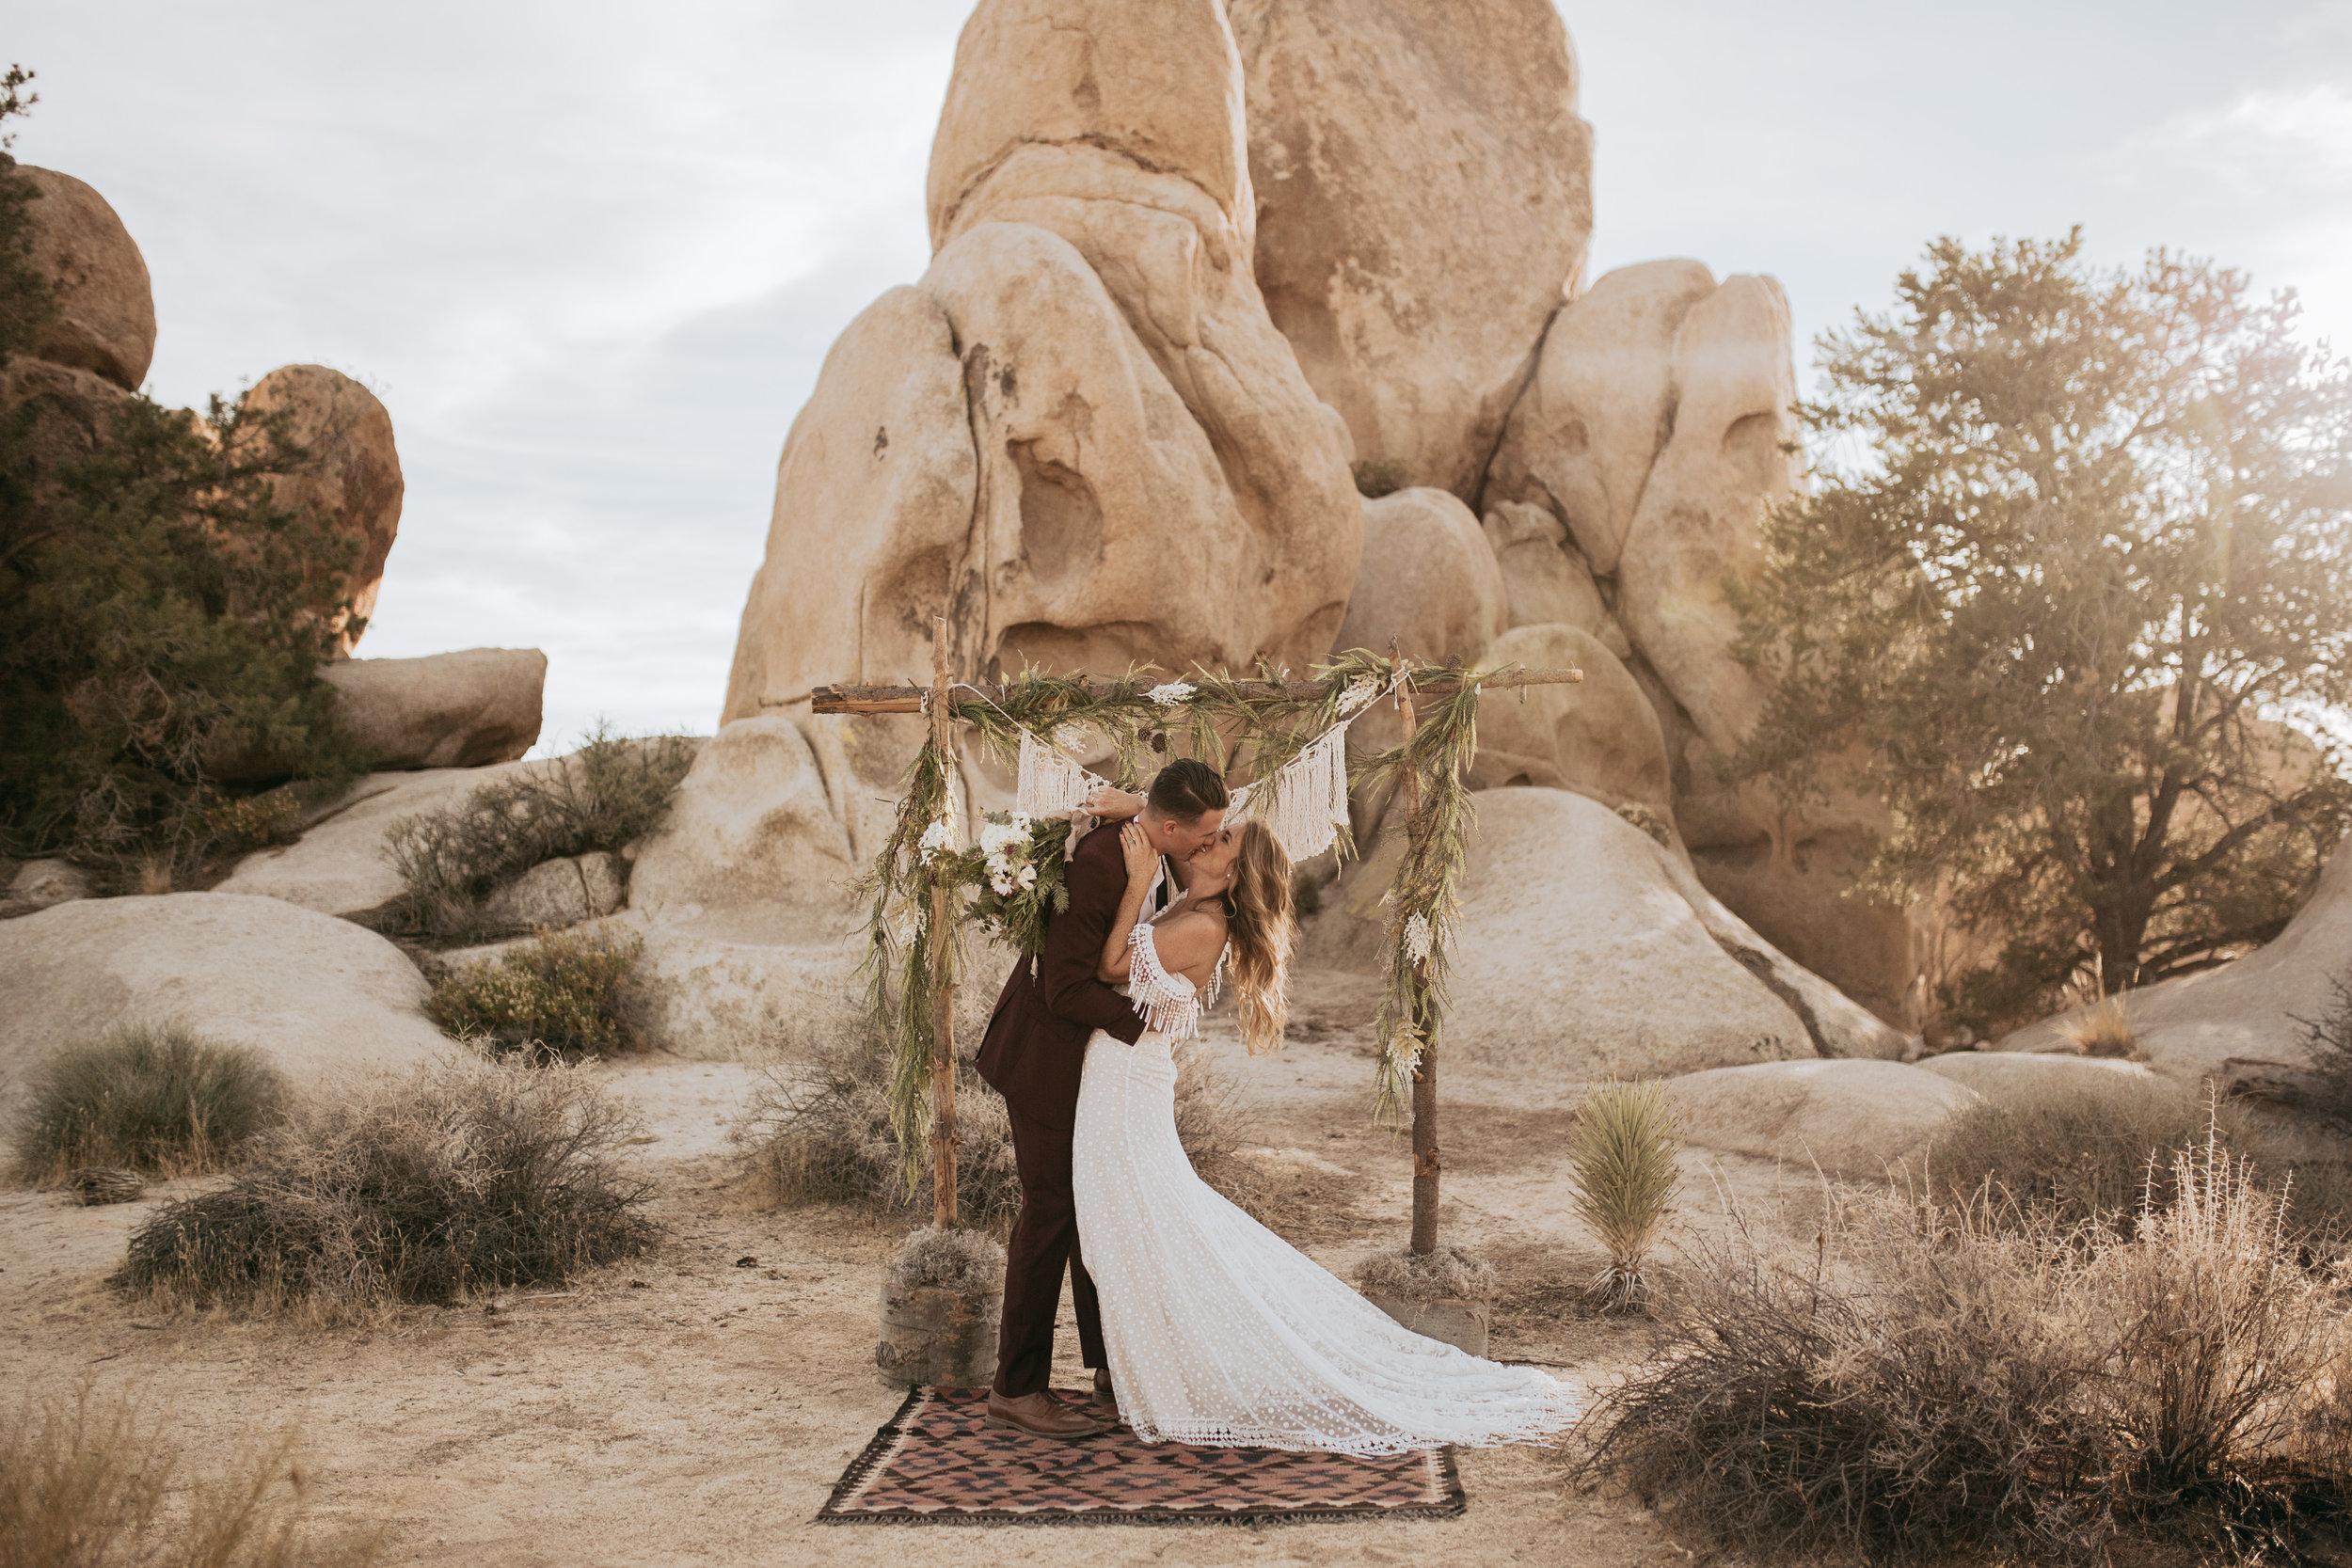 palmsprings_joshuatree_california_wedding_photographer-15.jpg